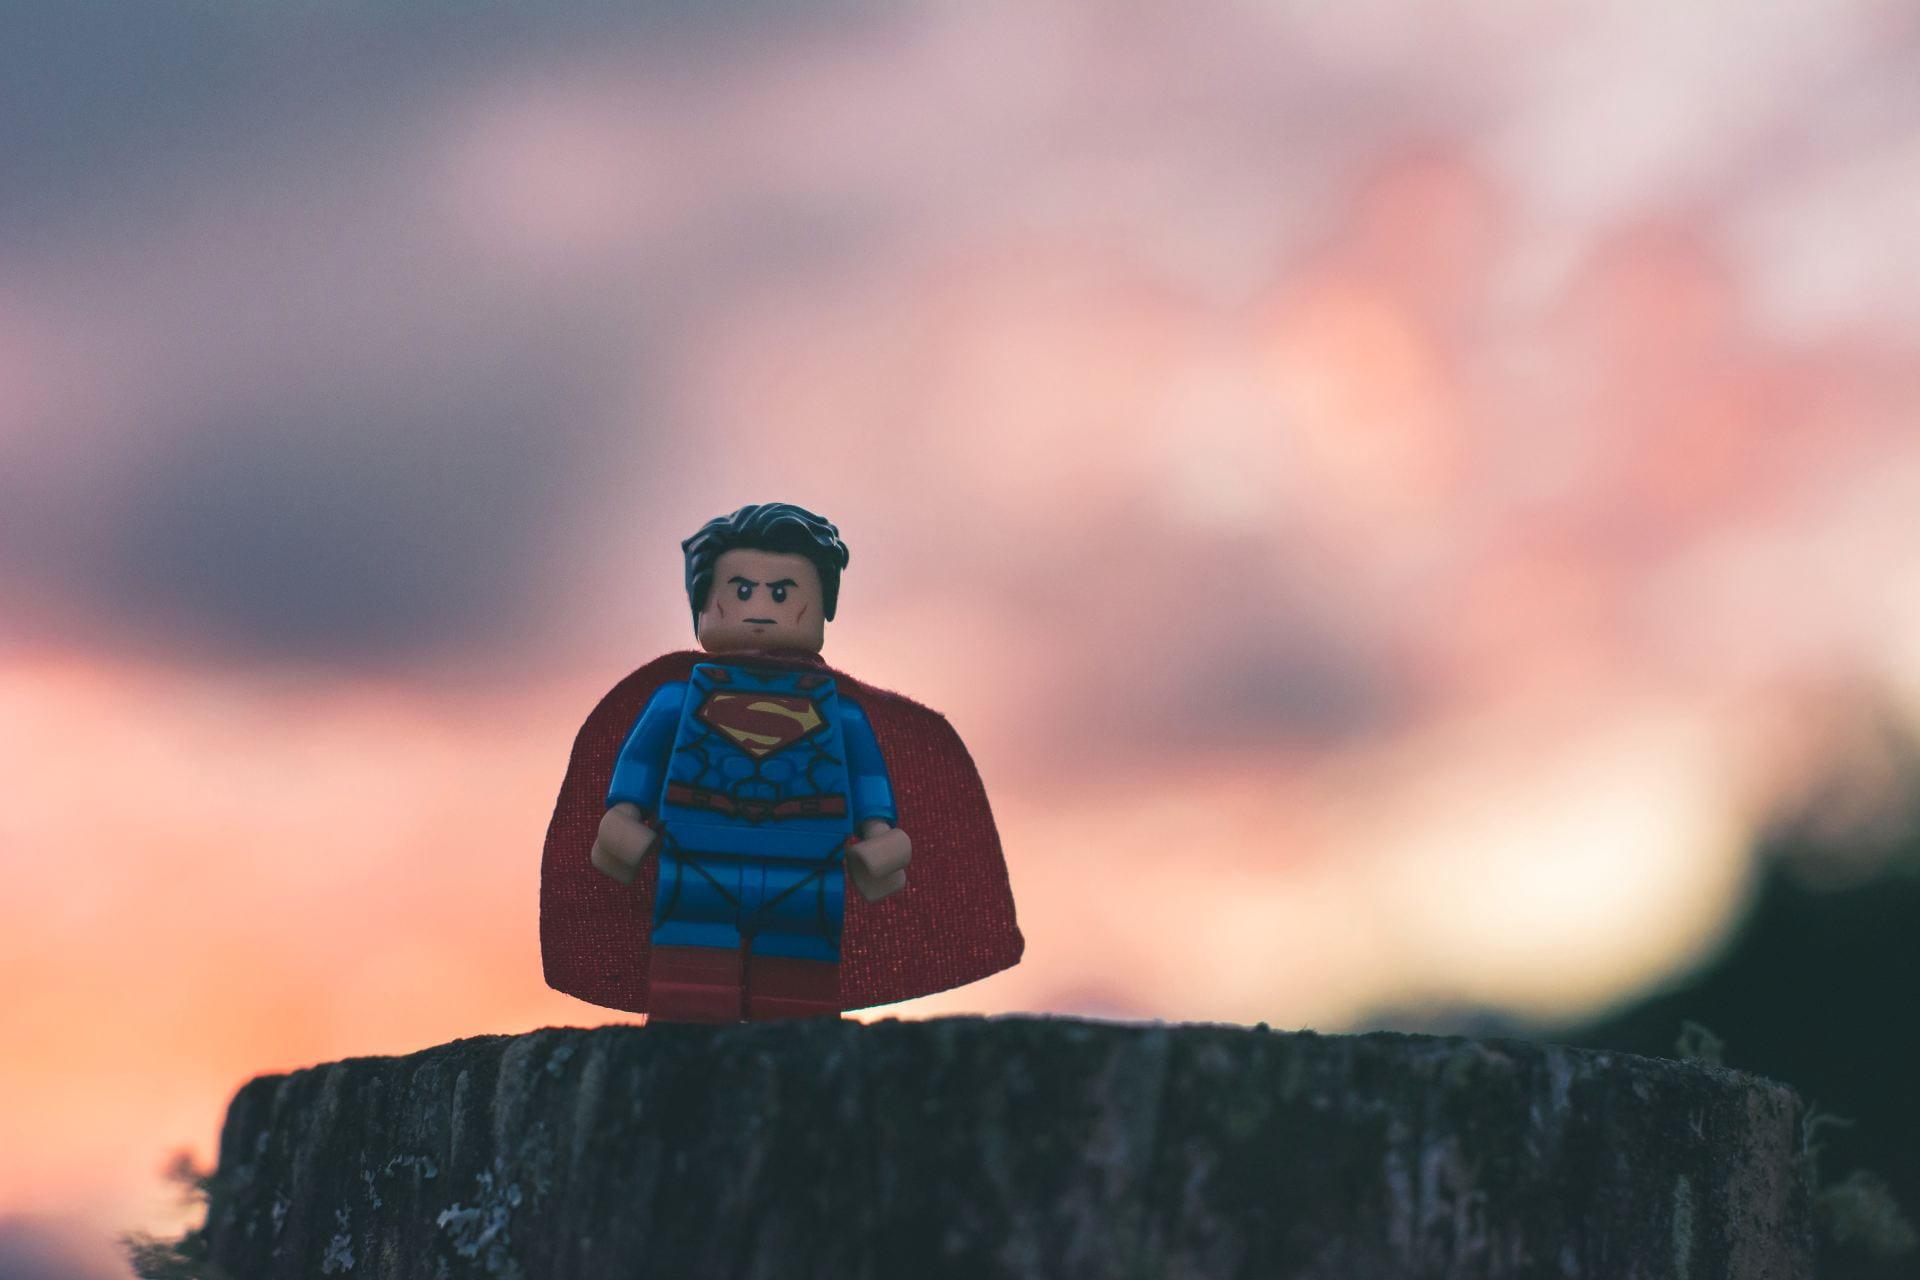 Long shot of Lego Super Man atop a stump.